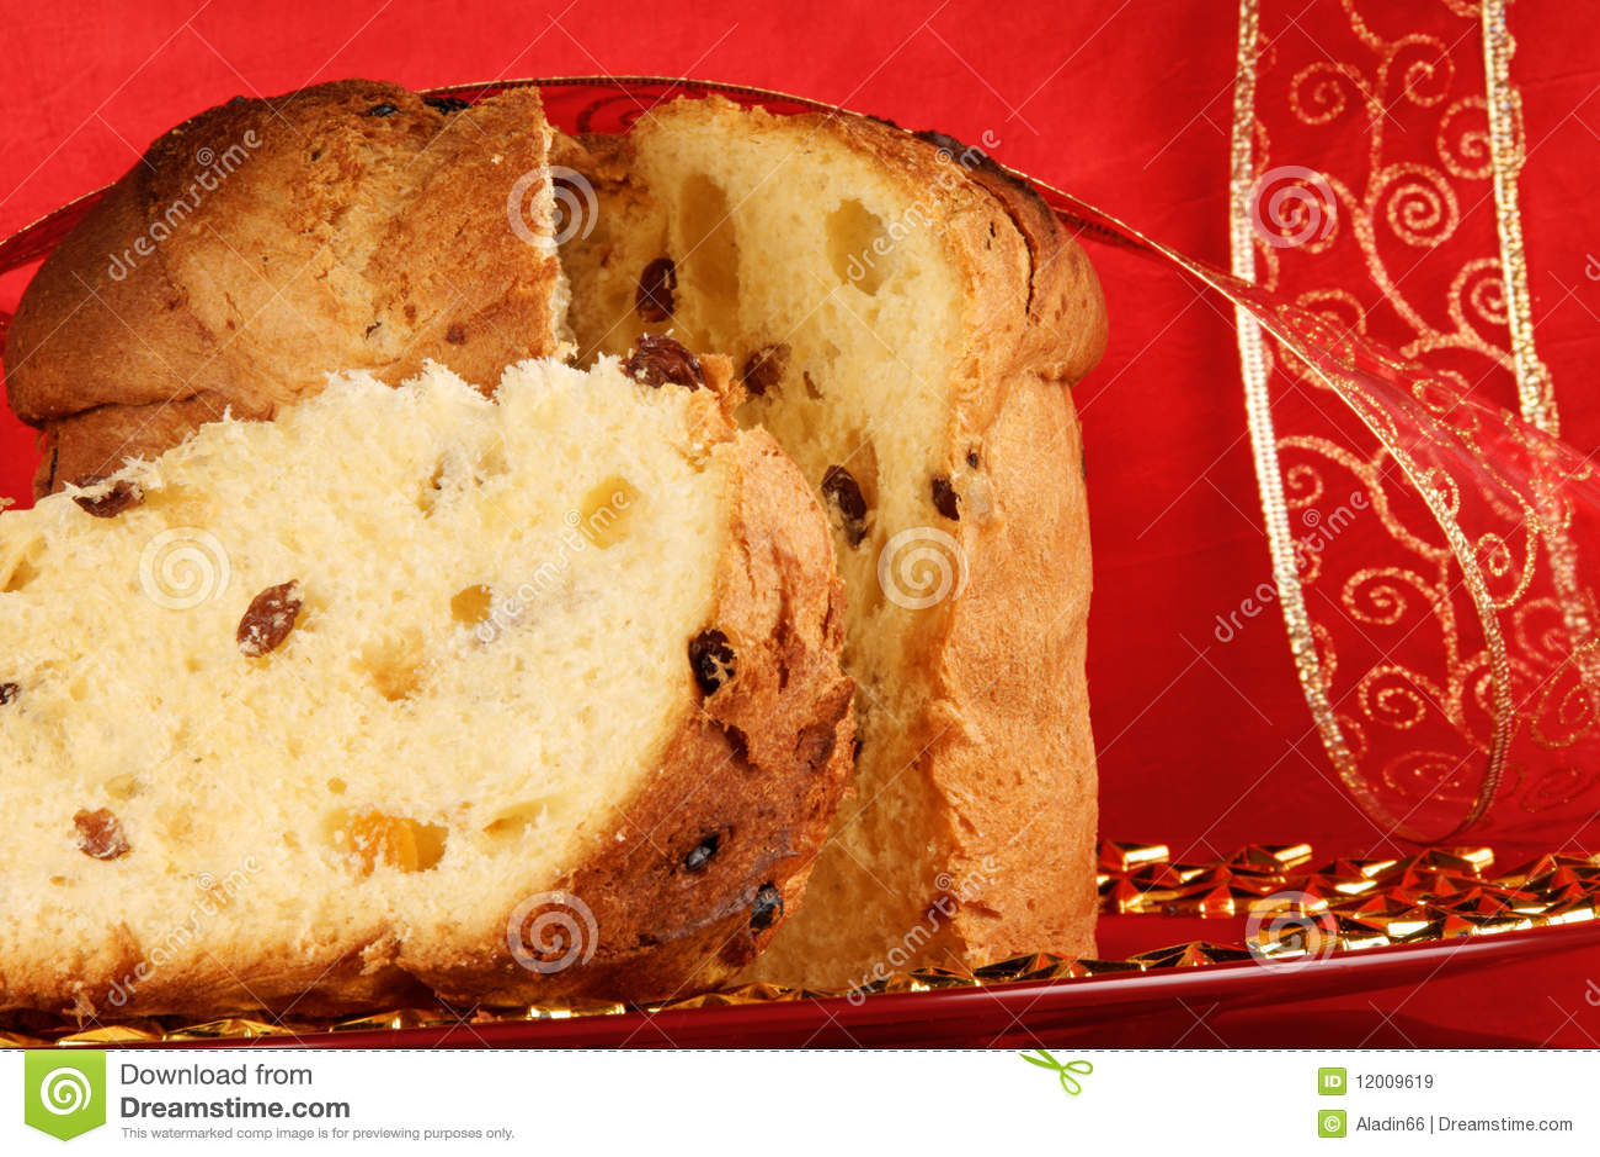 Panettone the italian Christmas cake